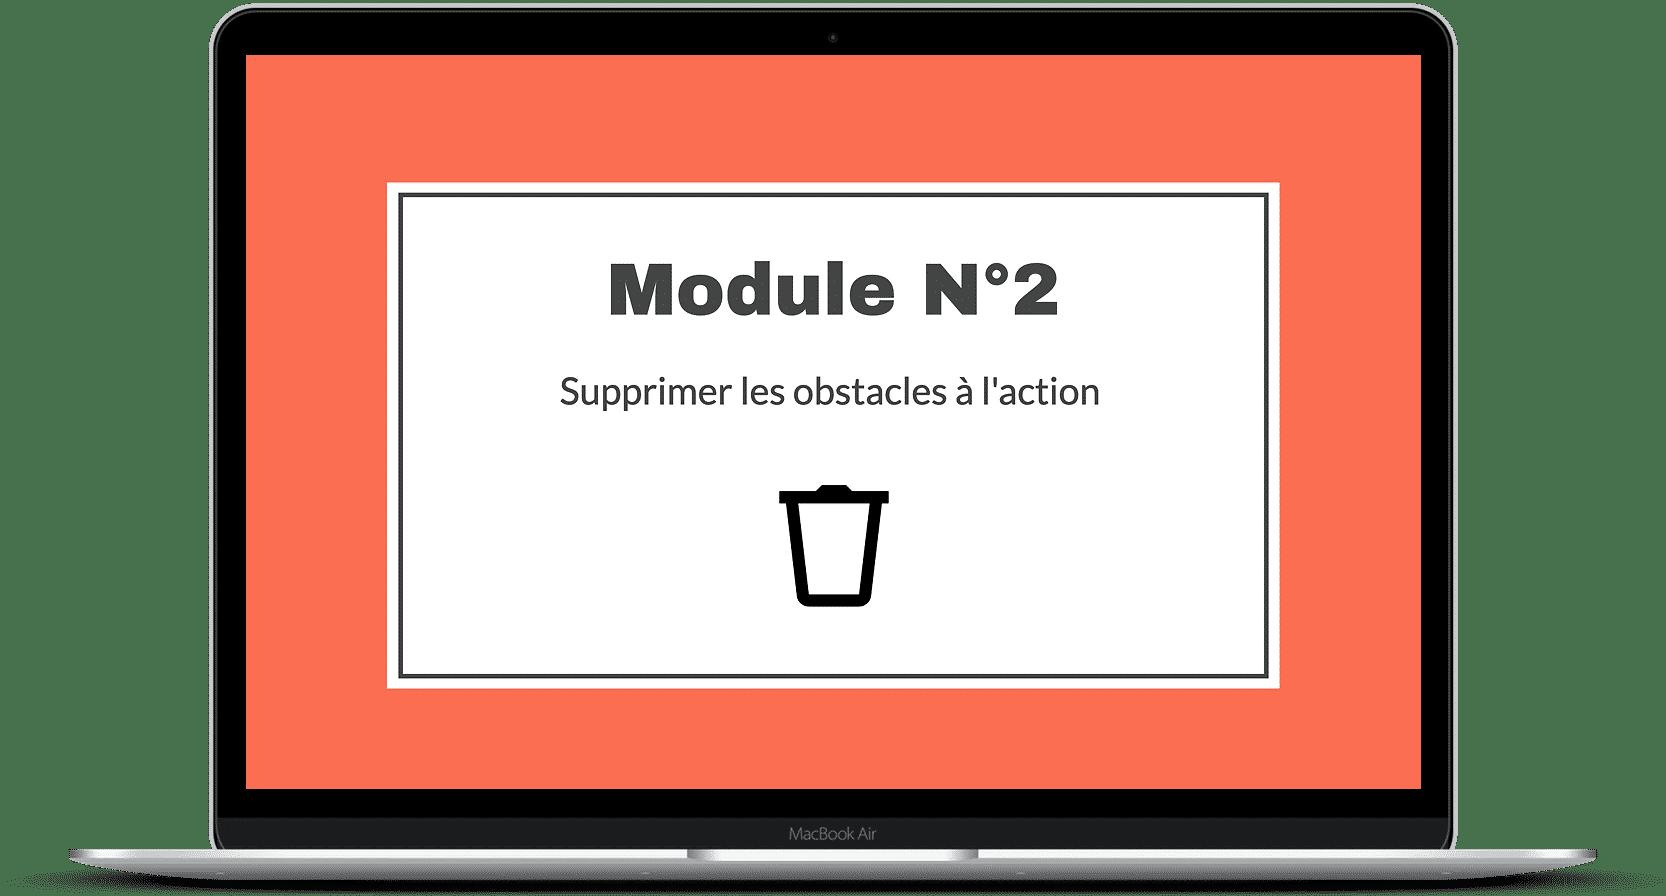 procrastination bénéfique module 2